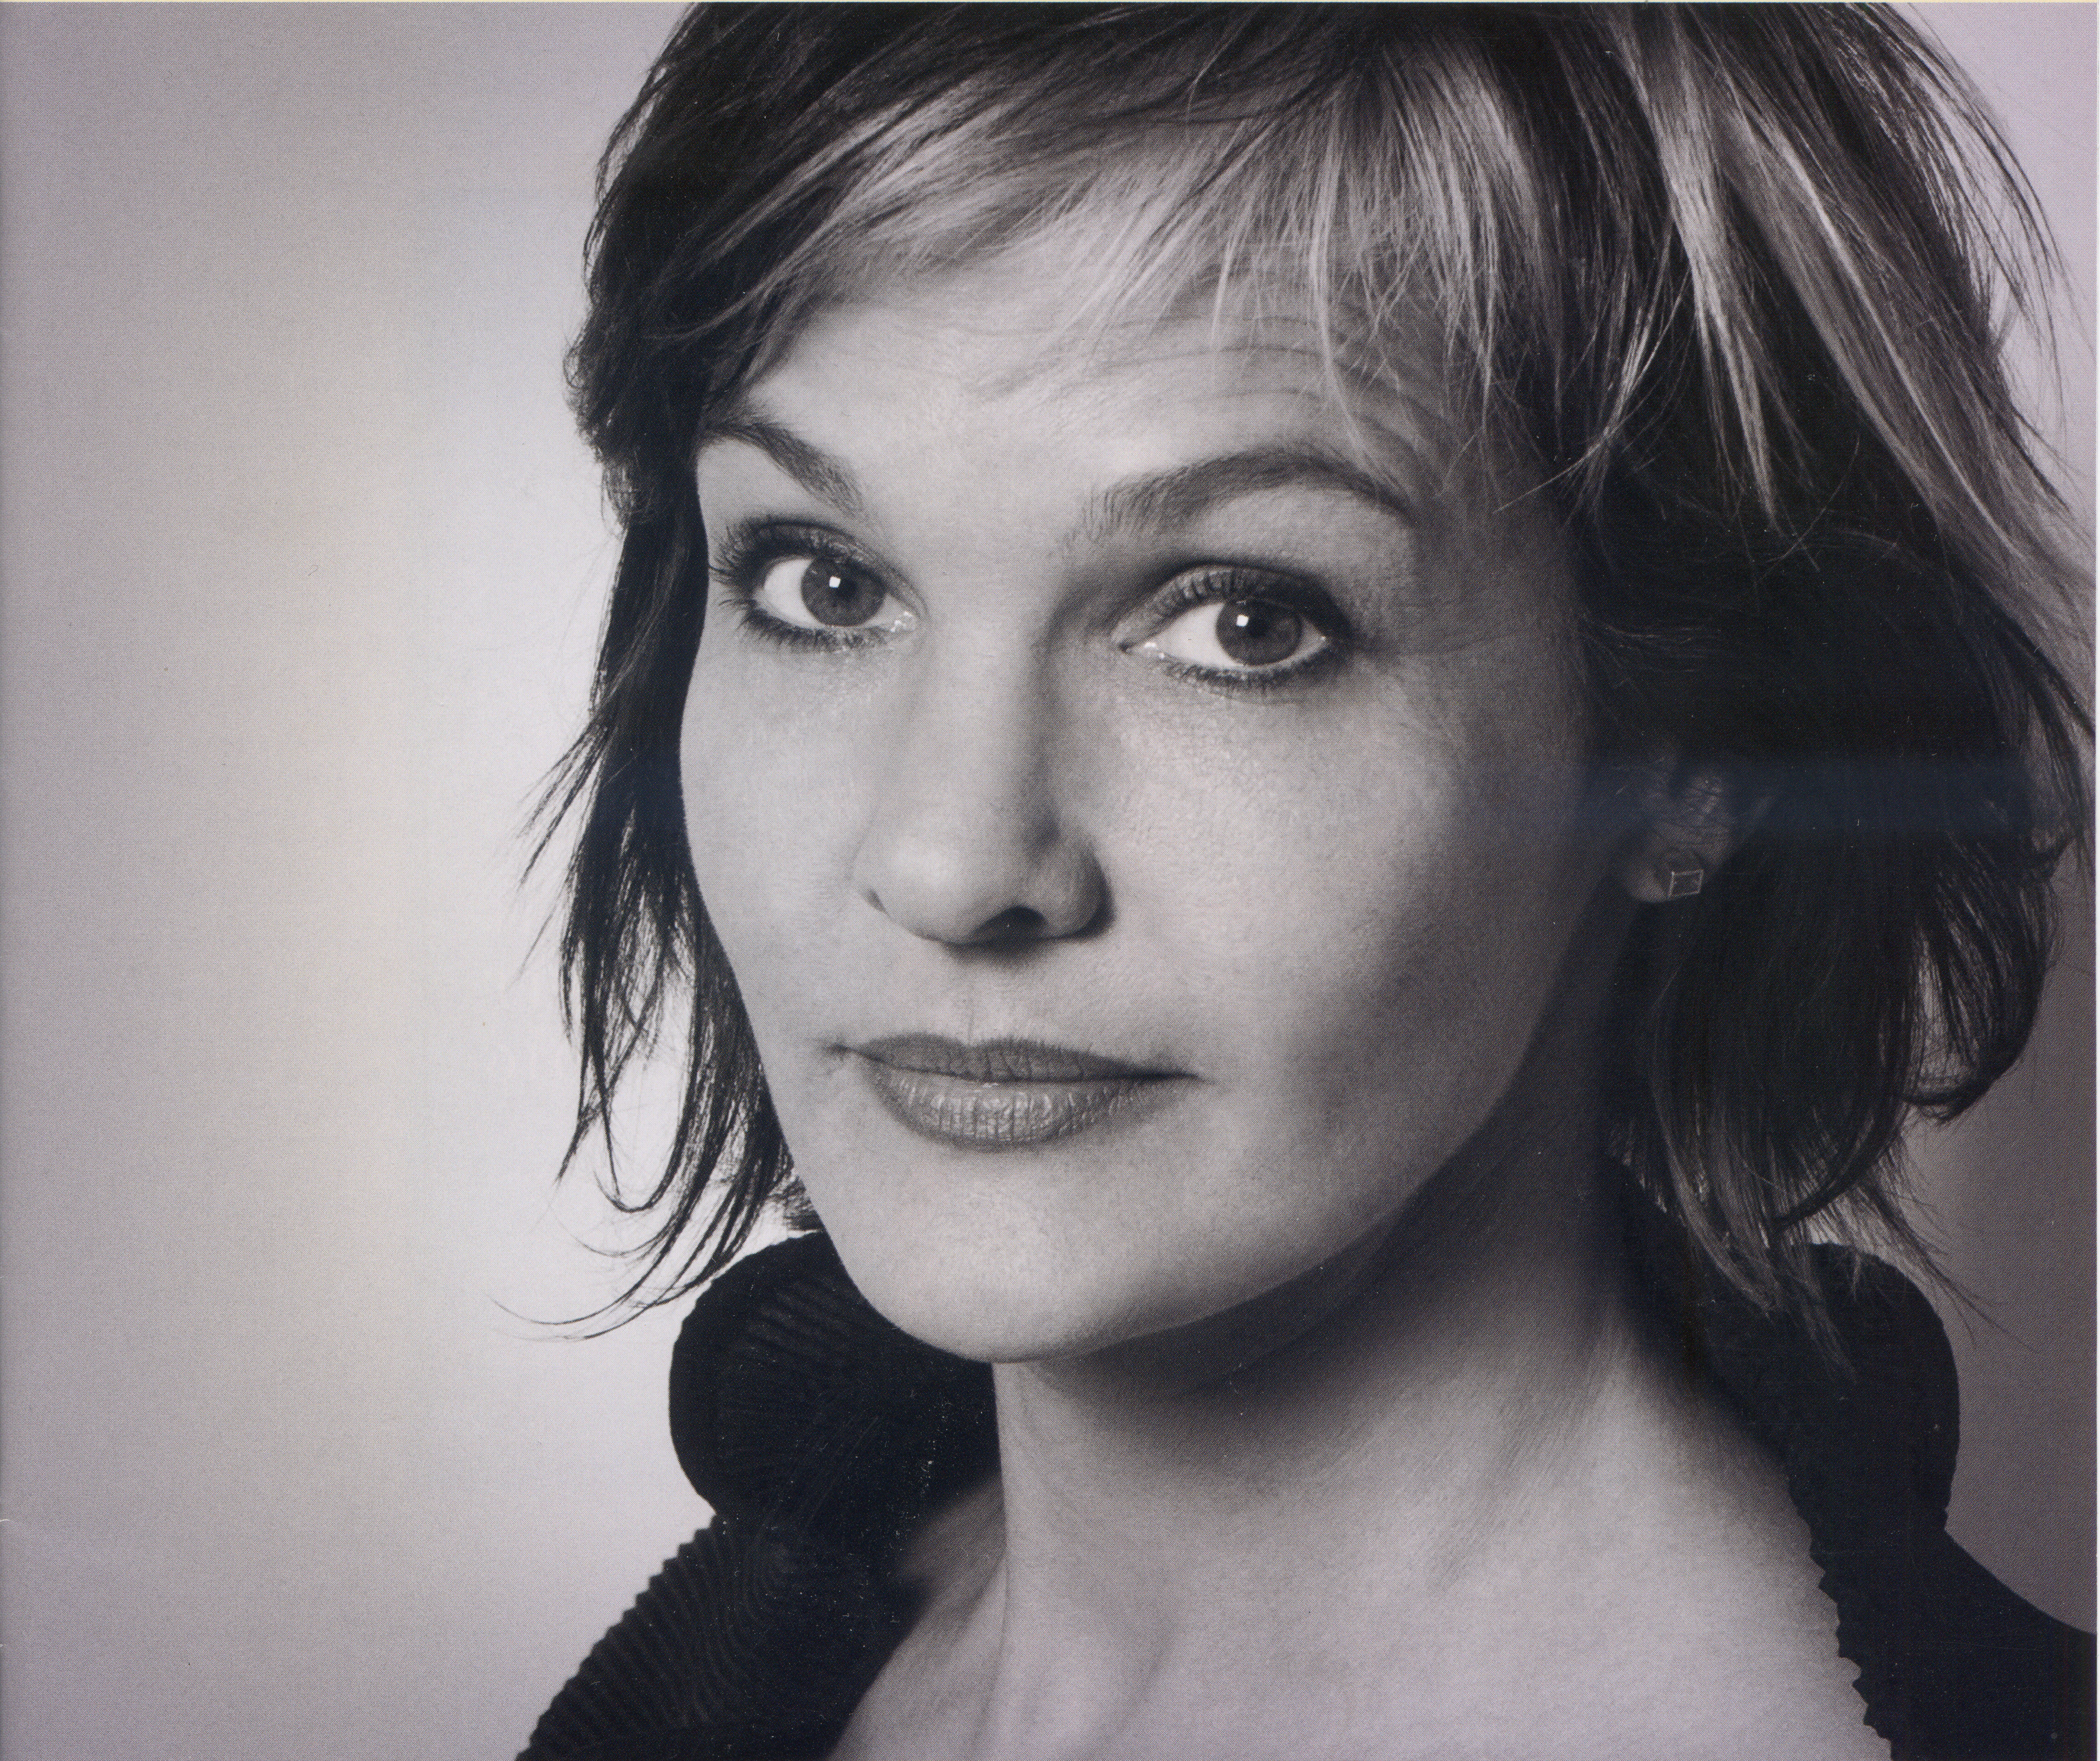 Marlis Petersen